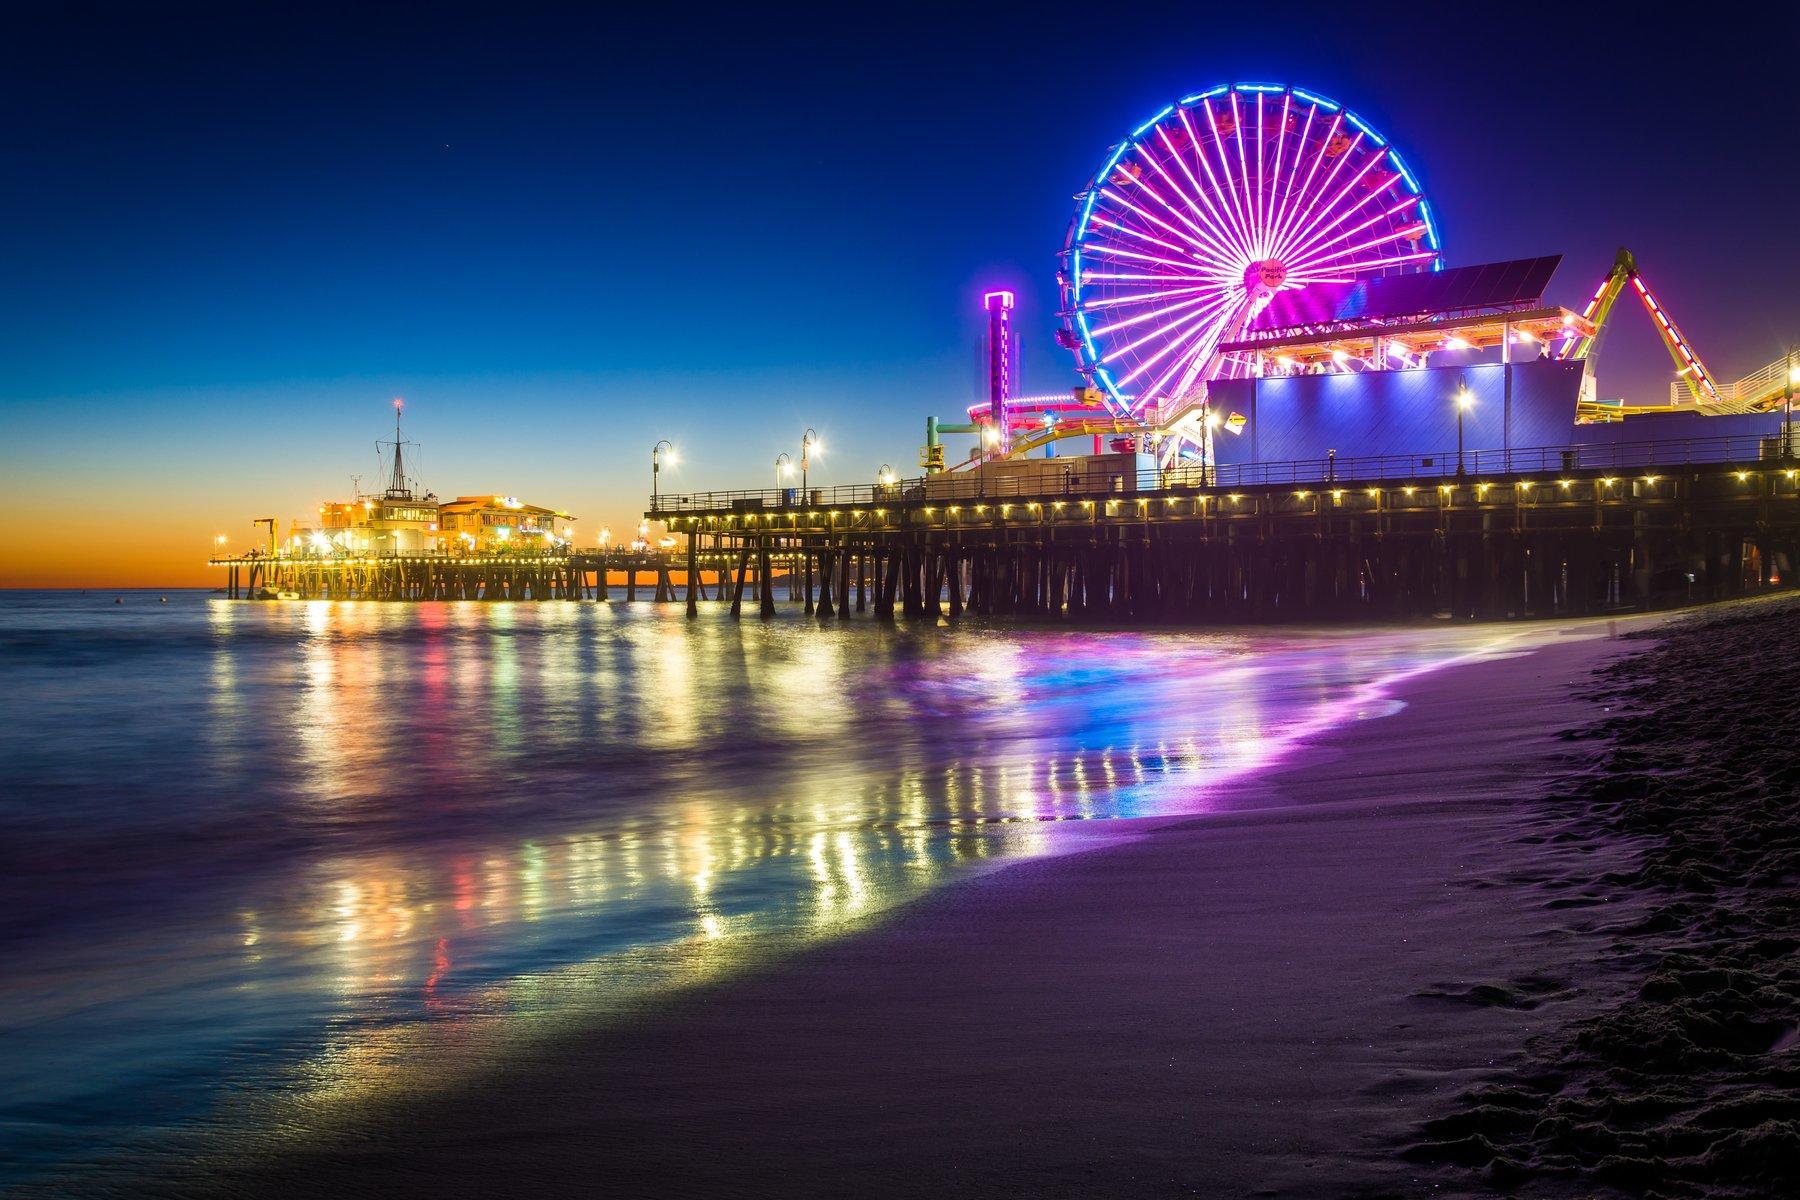 Santa Monica Pier lit up at dusk